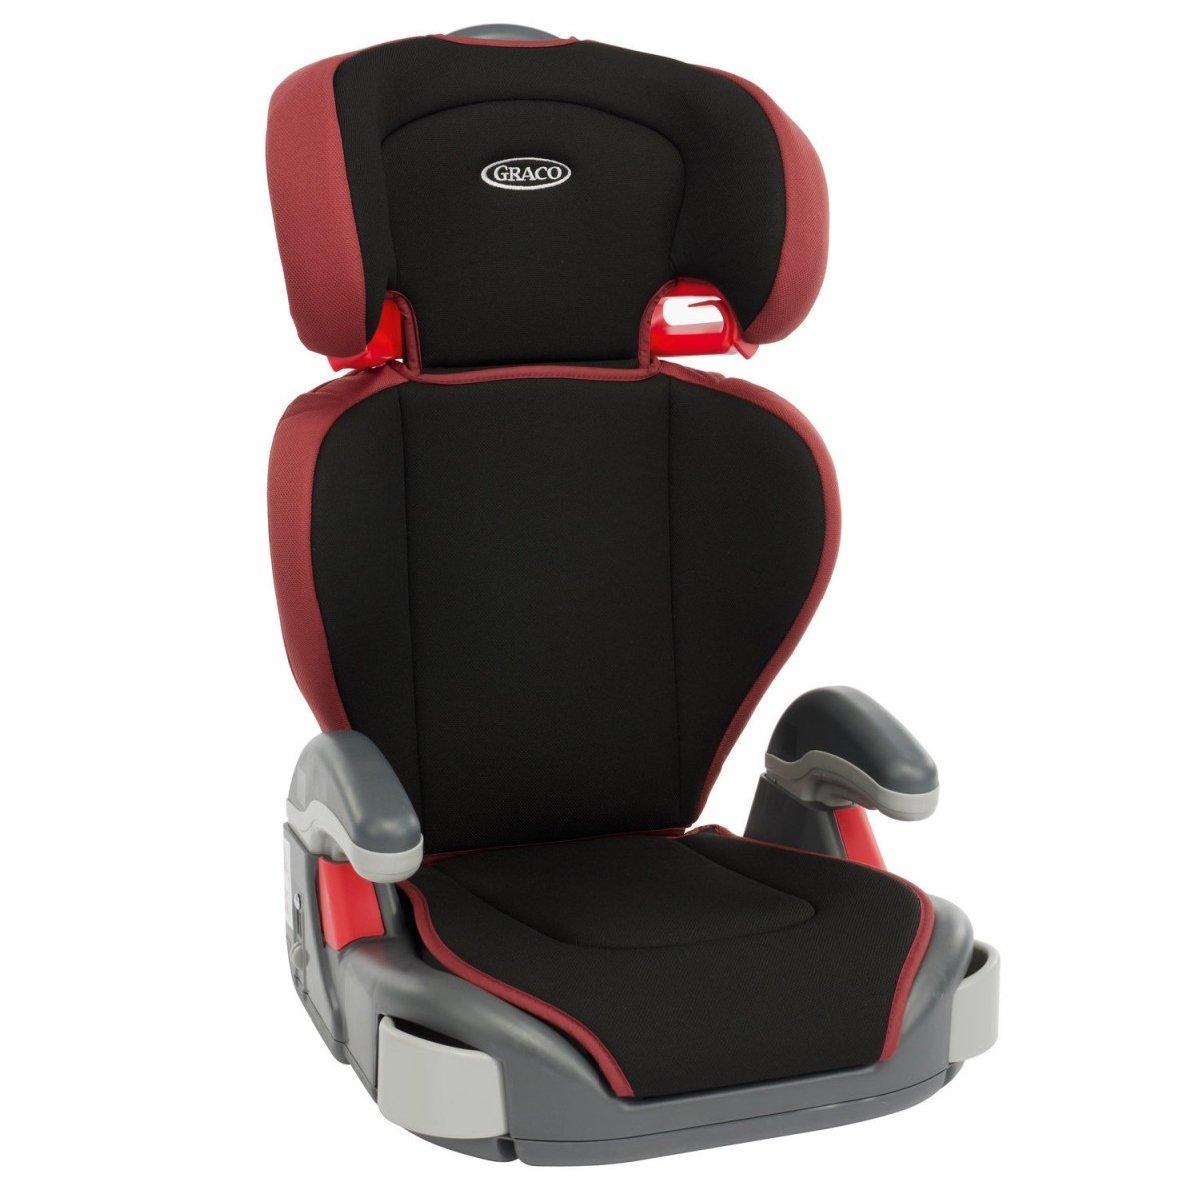 Graco Car Seat Images